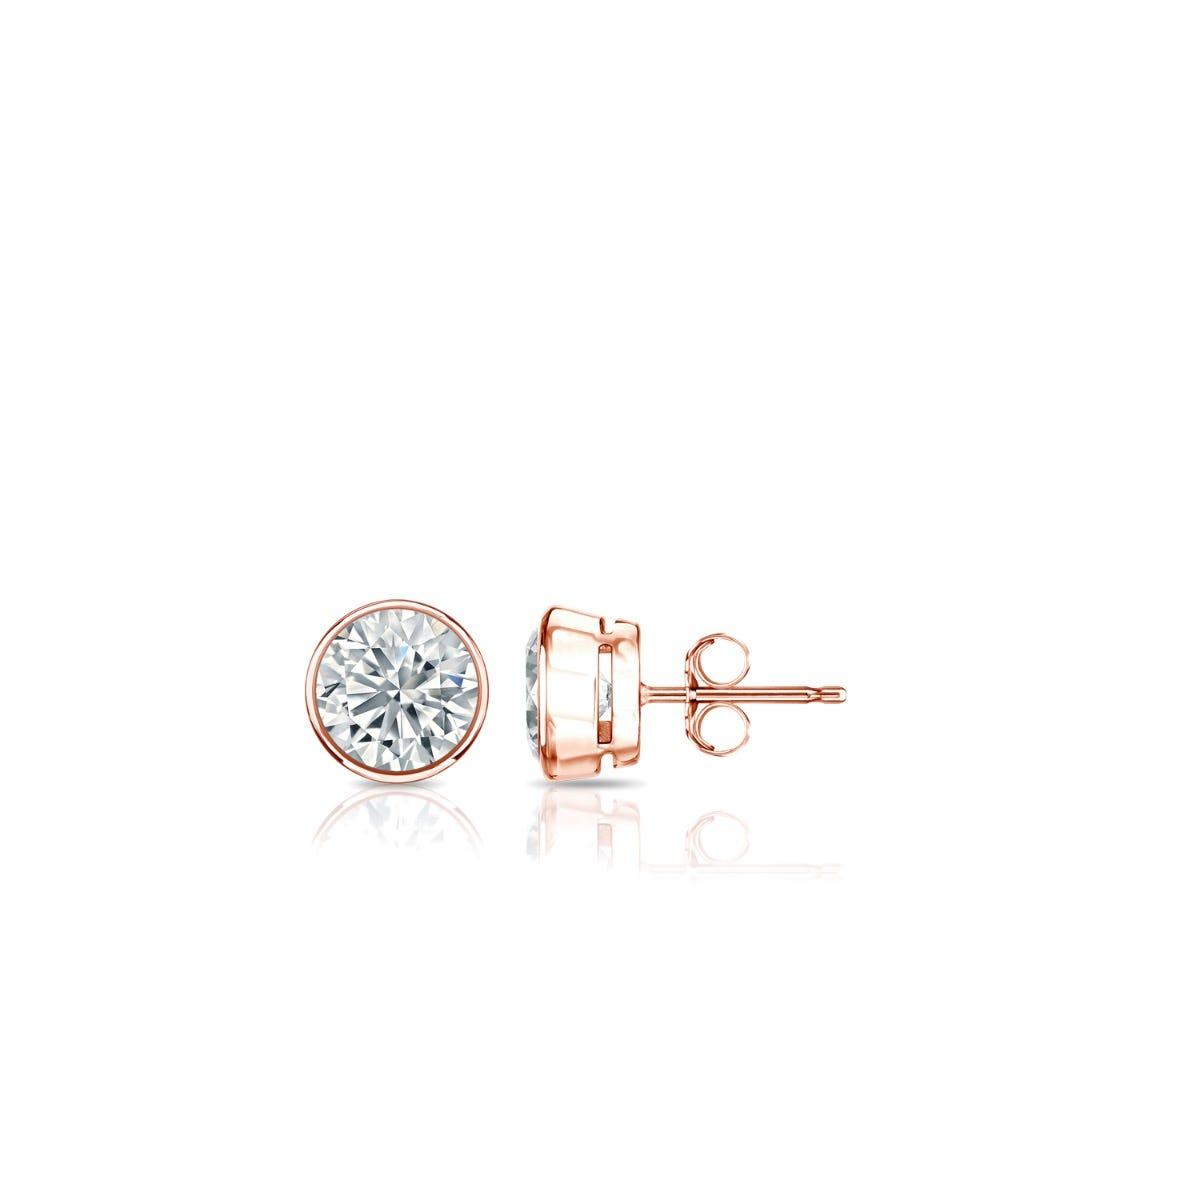 Diamond Round Bezel-Set 1/10ctw. Solitaire Stud (IJ-I2) Earrings in 10K Rose Gold